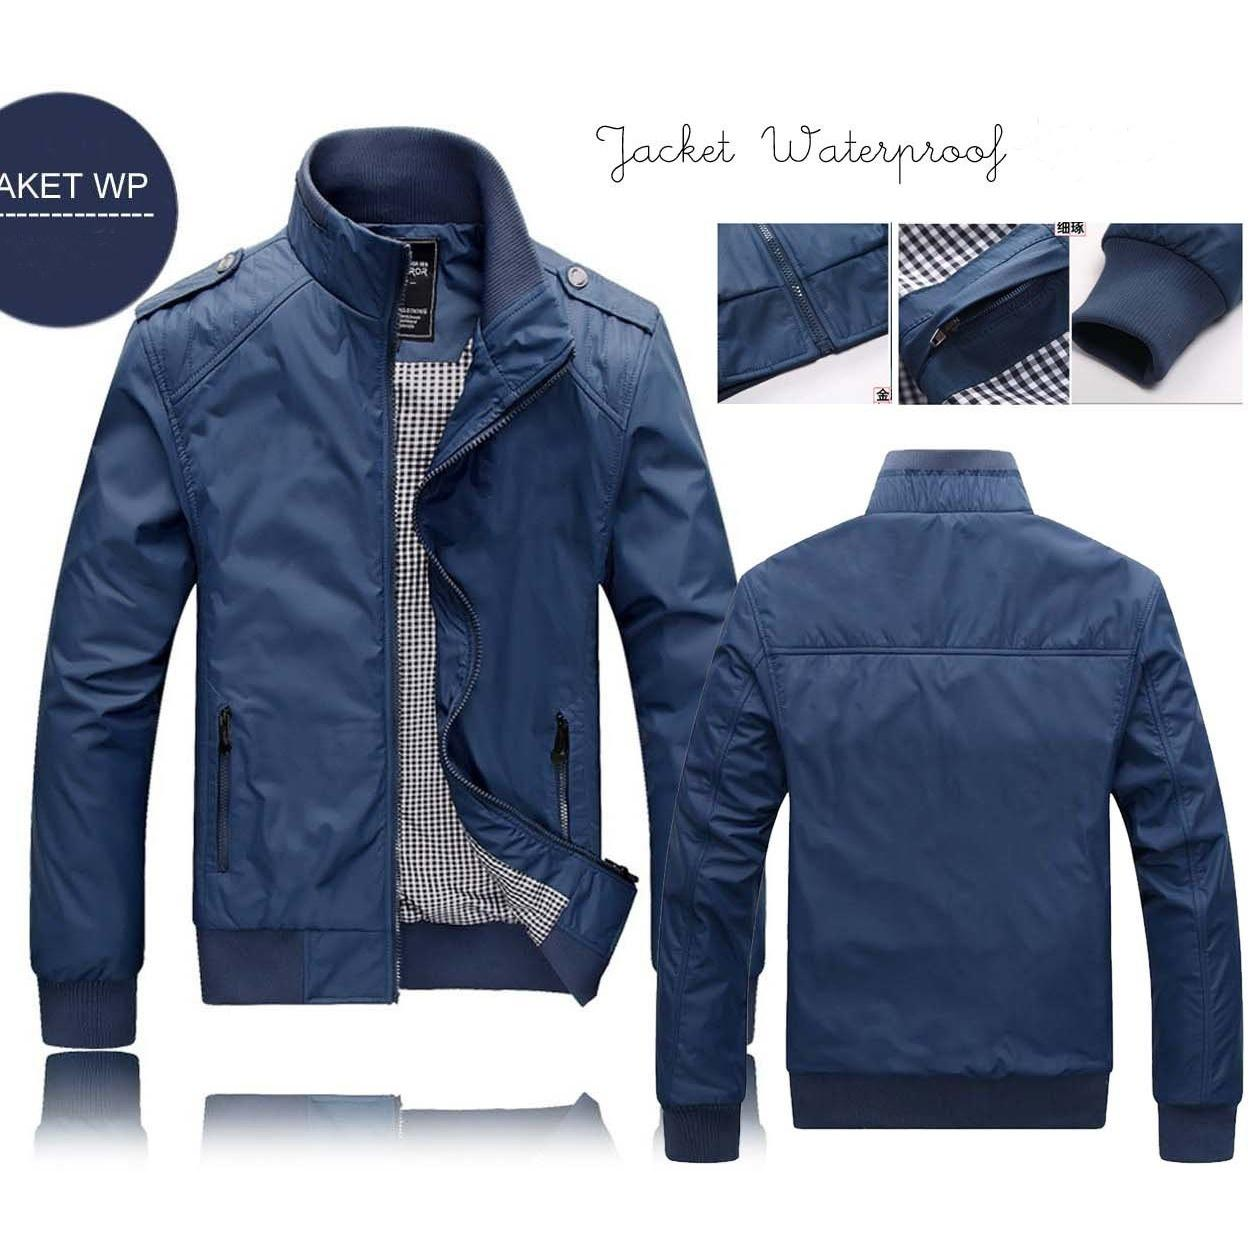 Jaket Wp Biru Polos. Tersedia Semua Logo Club Bola. Jacket Soccer Waterproof Promo Jaket Distro Murah Bandung Jaket Tahan Air Keren Bagus